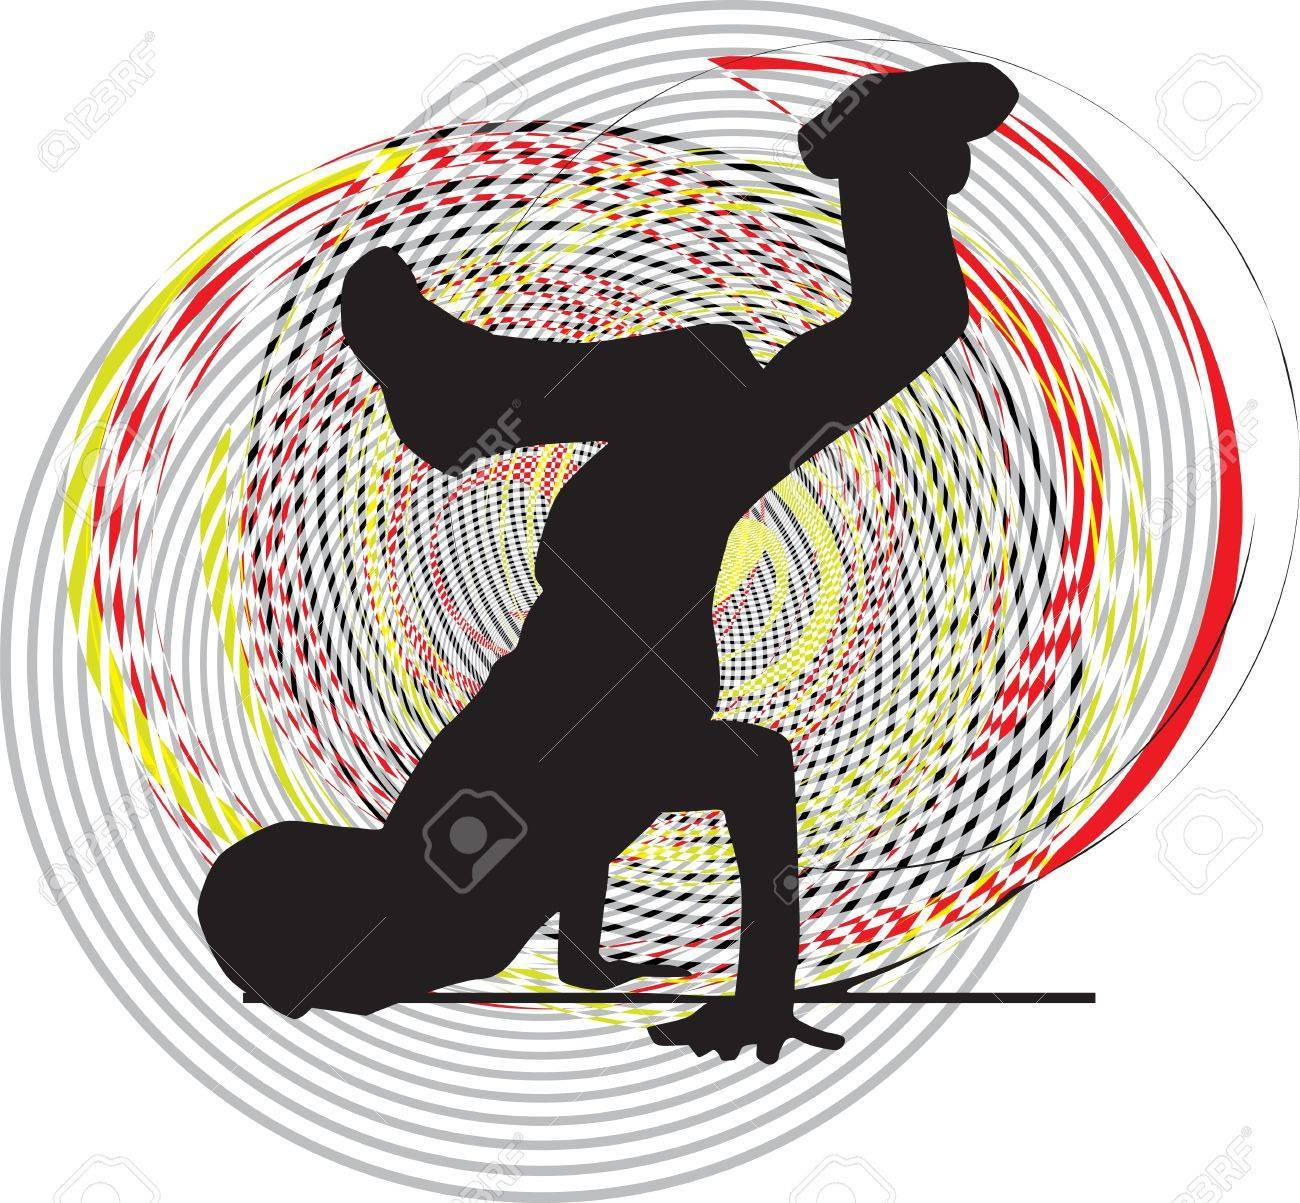 Breakdancer dancing on hand stand. Vector illustration Stock Vector - 11001220